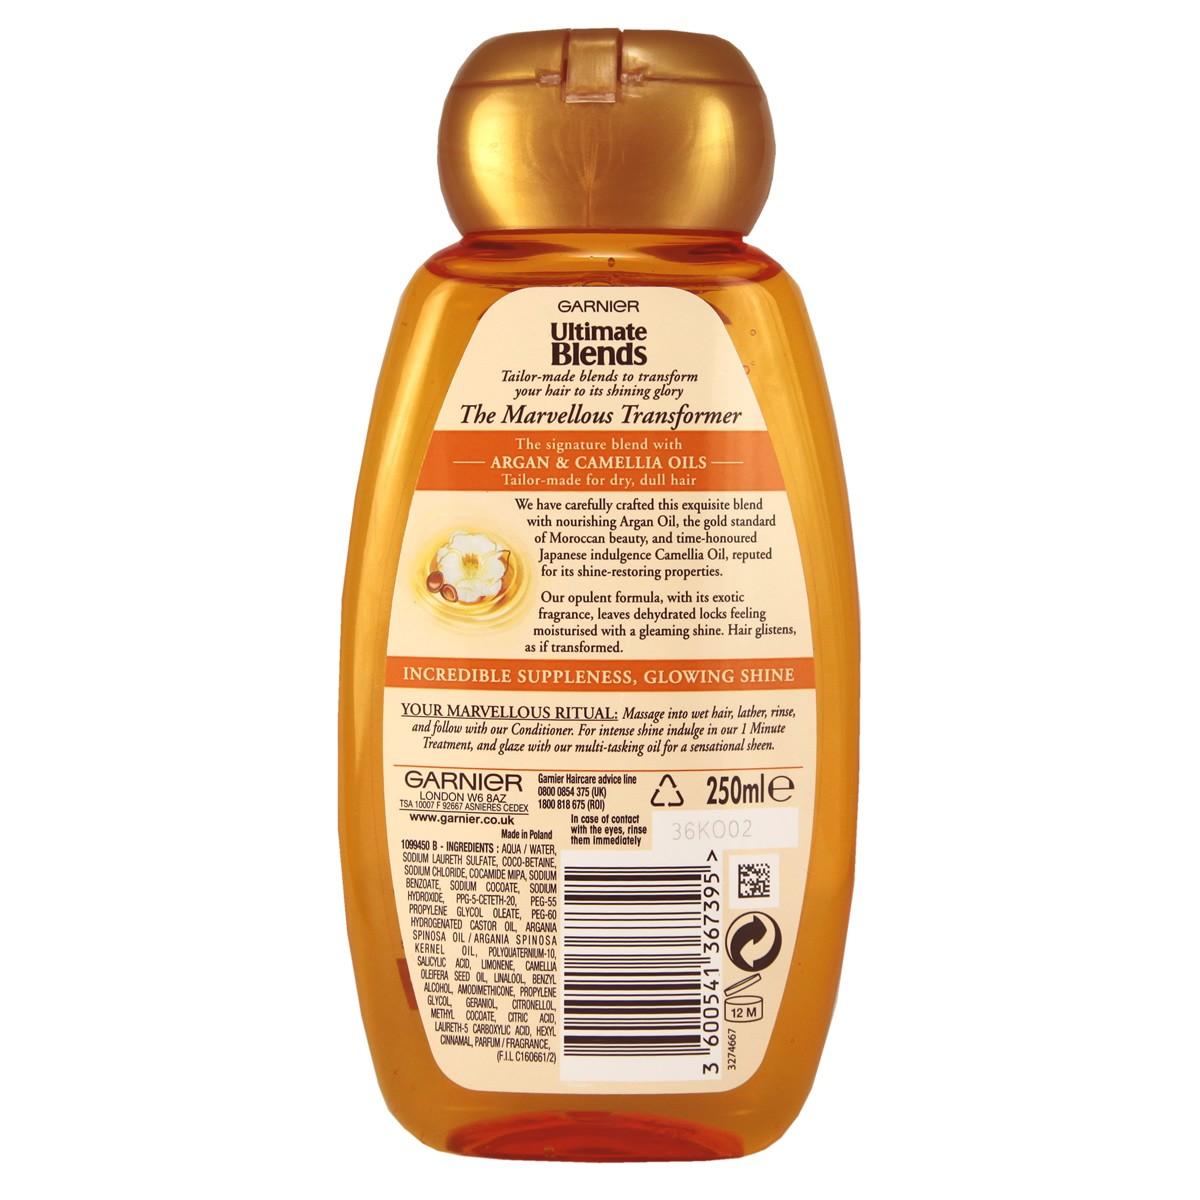 Garnier Ultimate Blends The Marvellous Transformer Shampoo